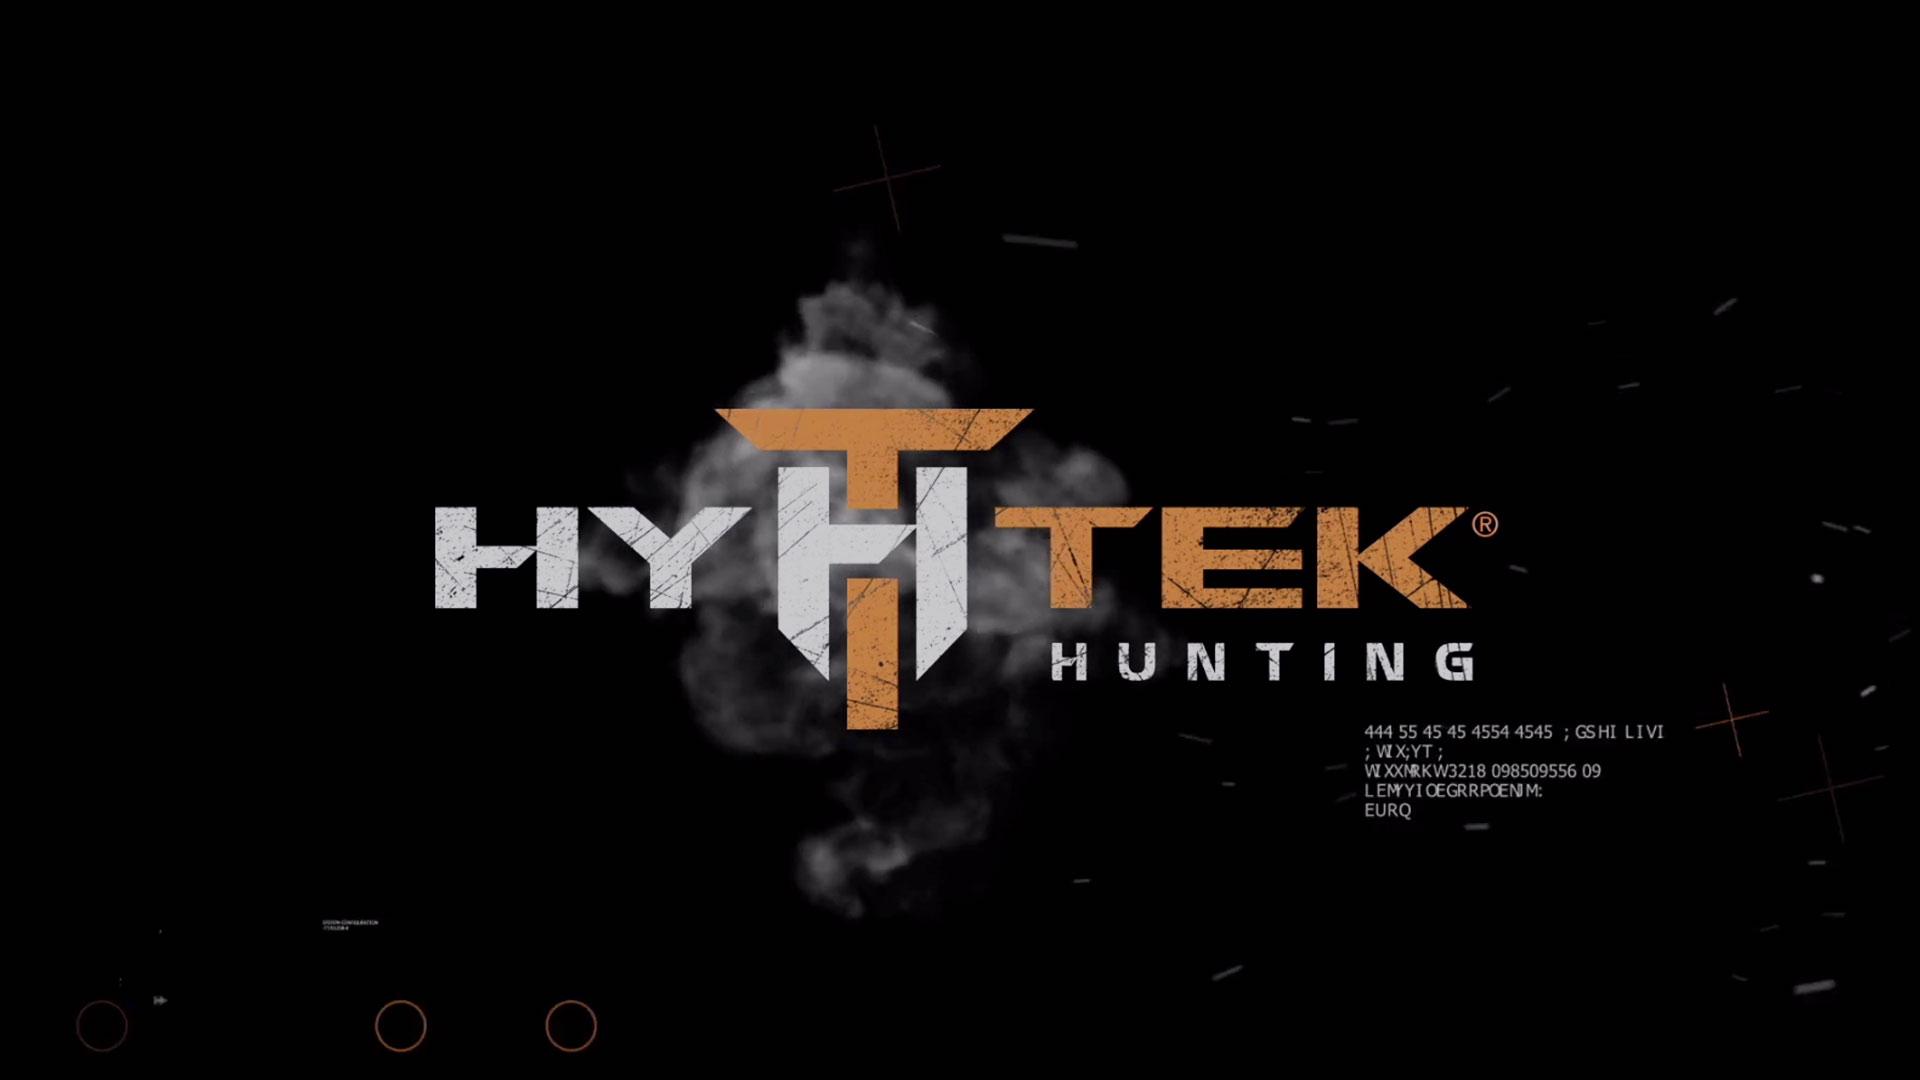 HyTek Hunting - Video Promo